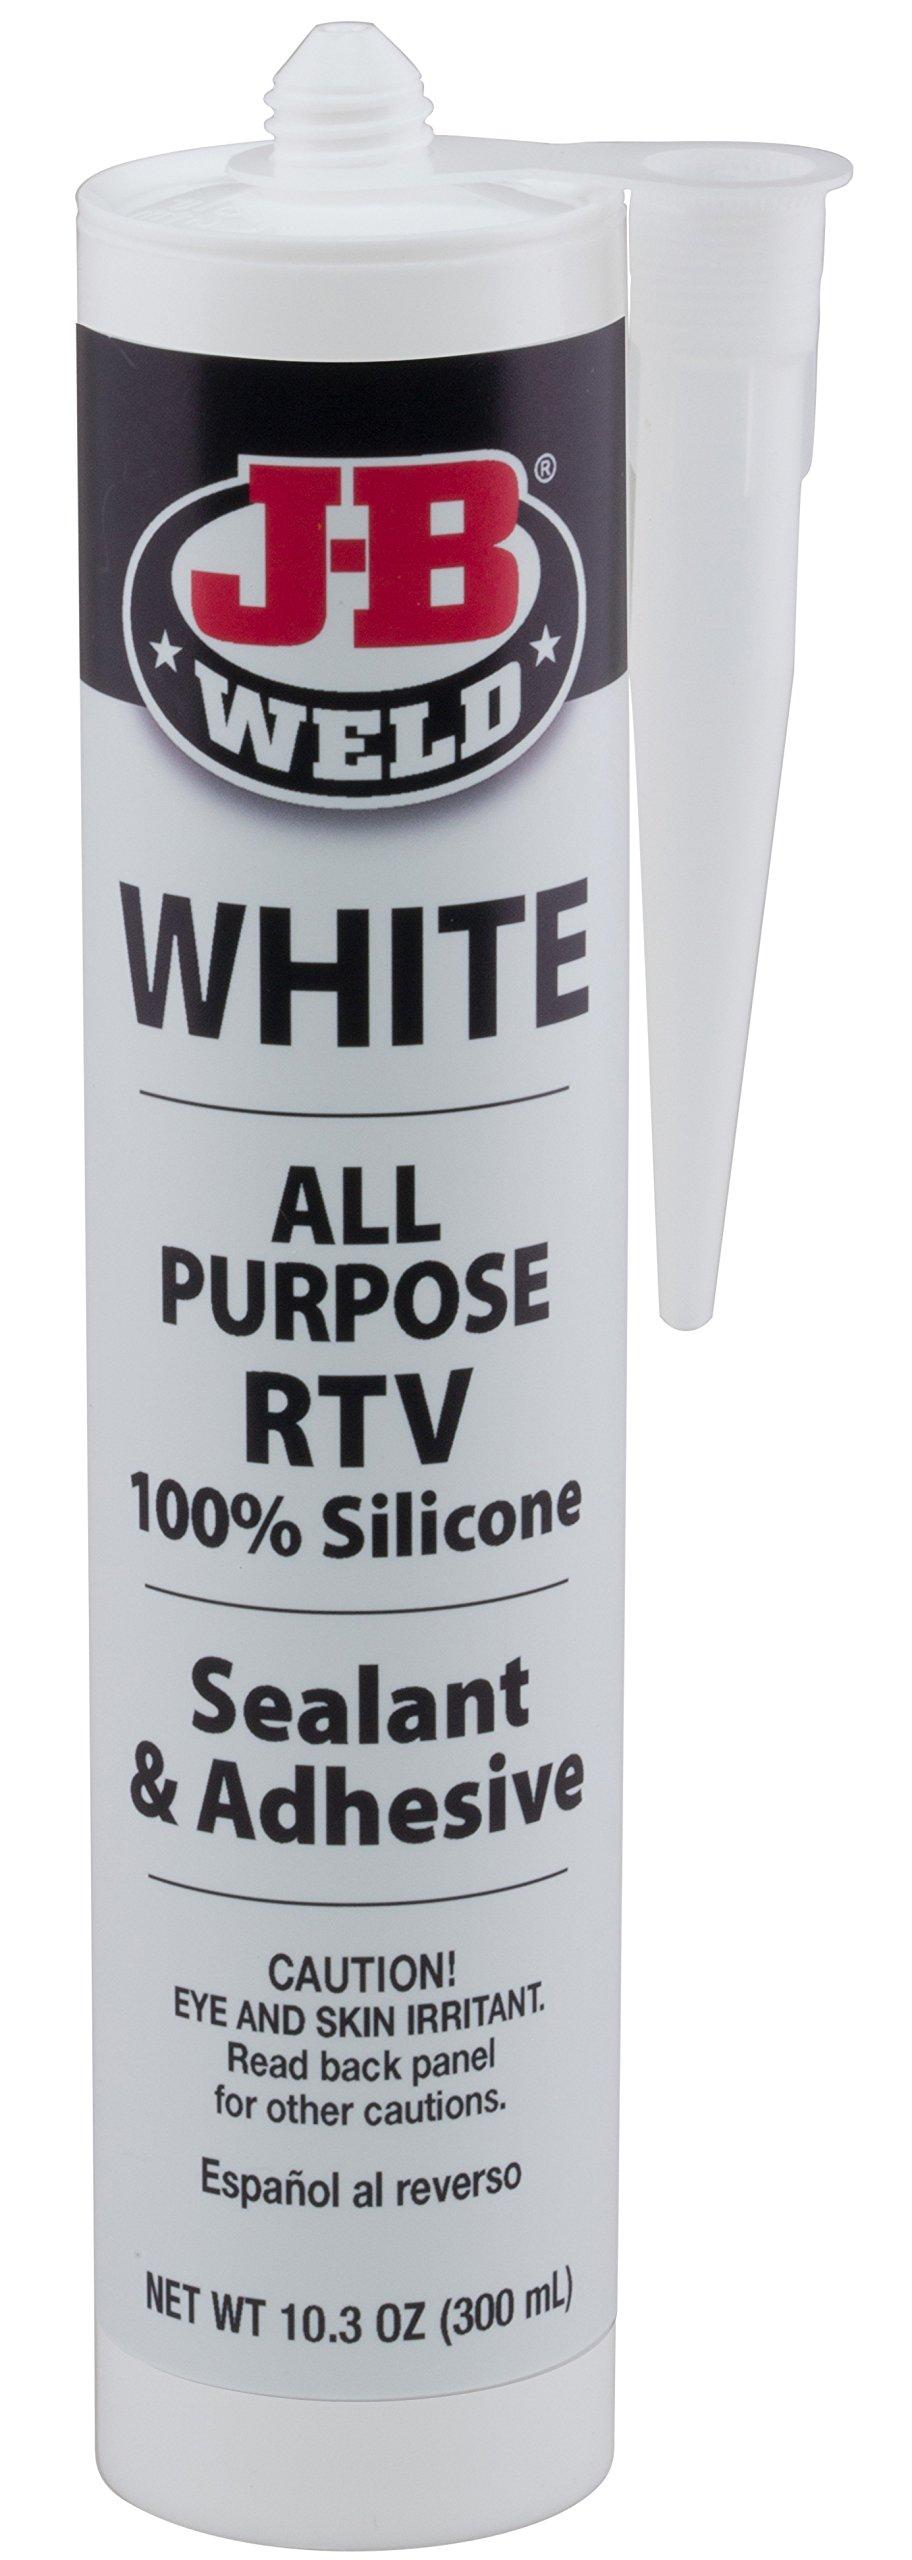 J-B Weld 31912 White All-Purpose RTV Silicone Sealant and Adhesive - 10.3 oz.